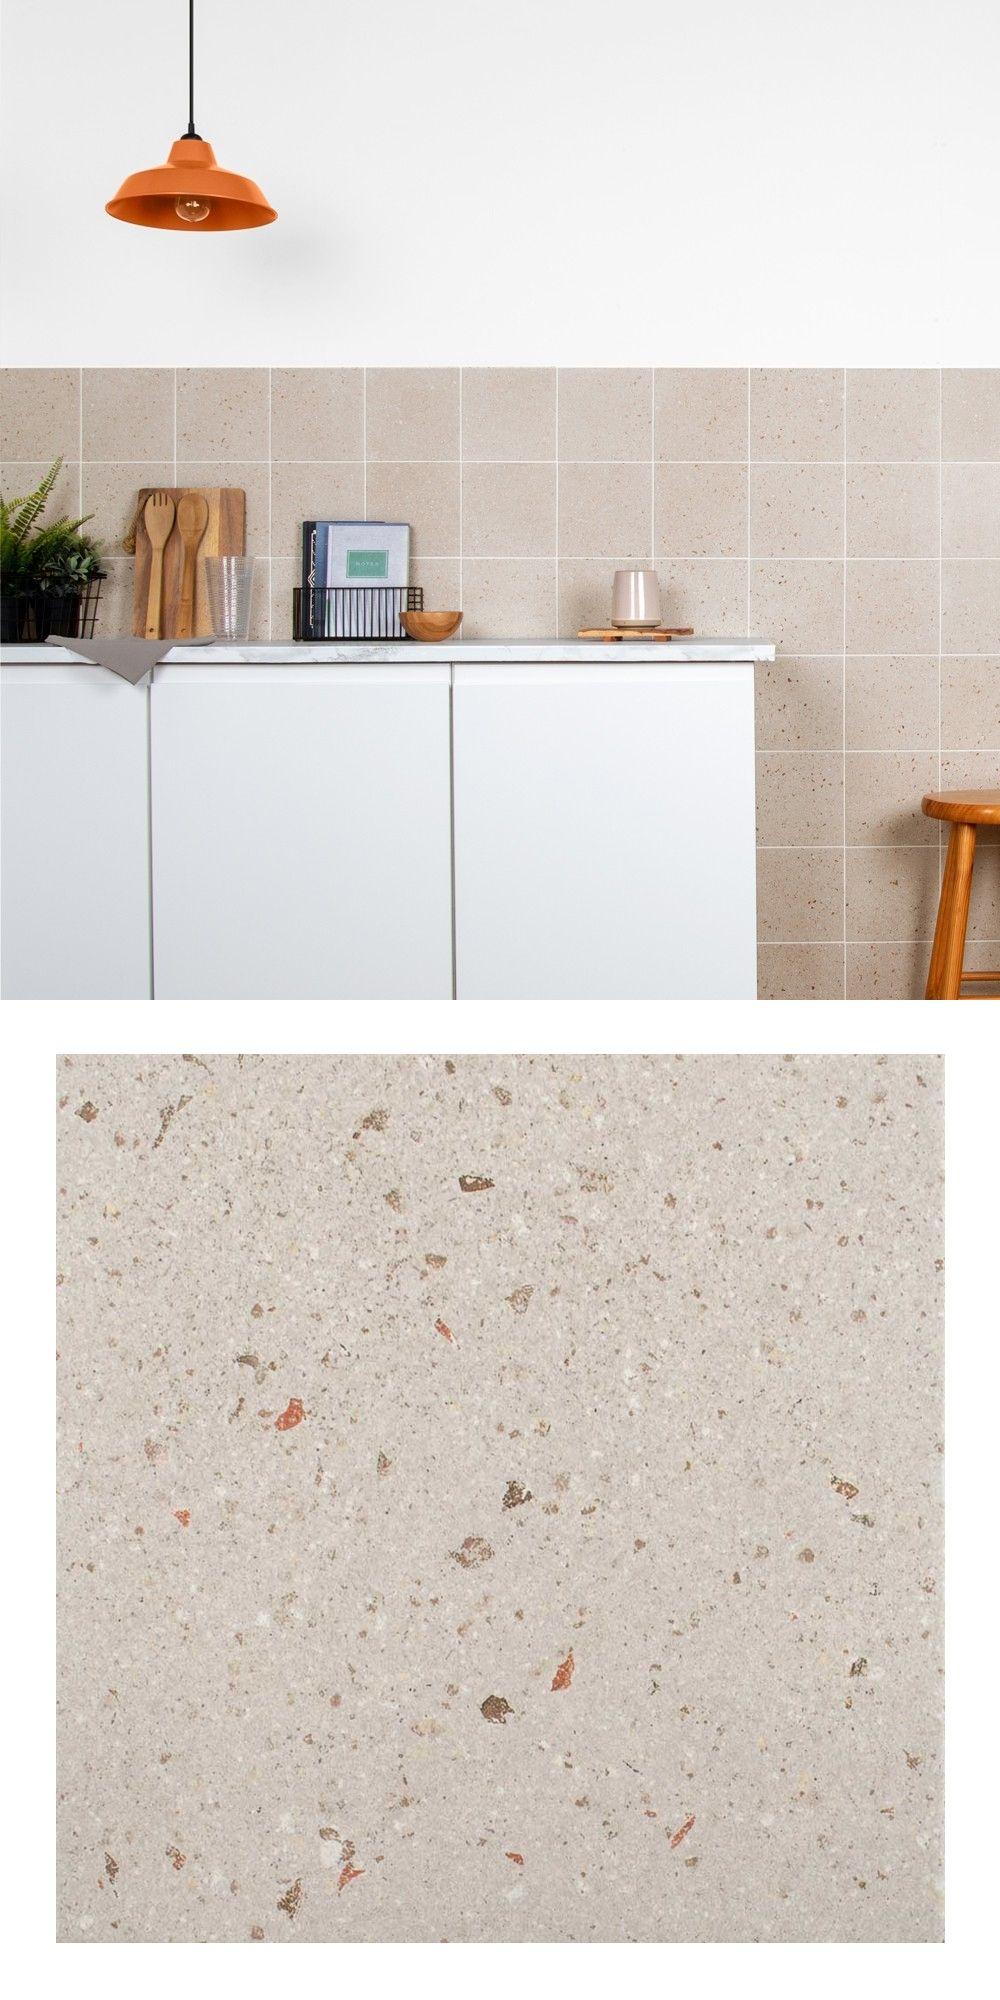 Dollymixx Beige Shroom Terrazzo Tiles in 2020 Terrazzo